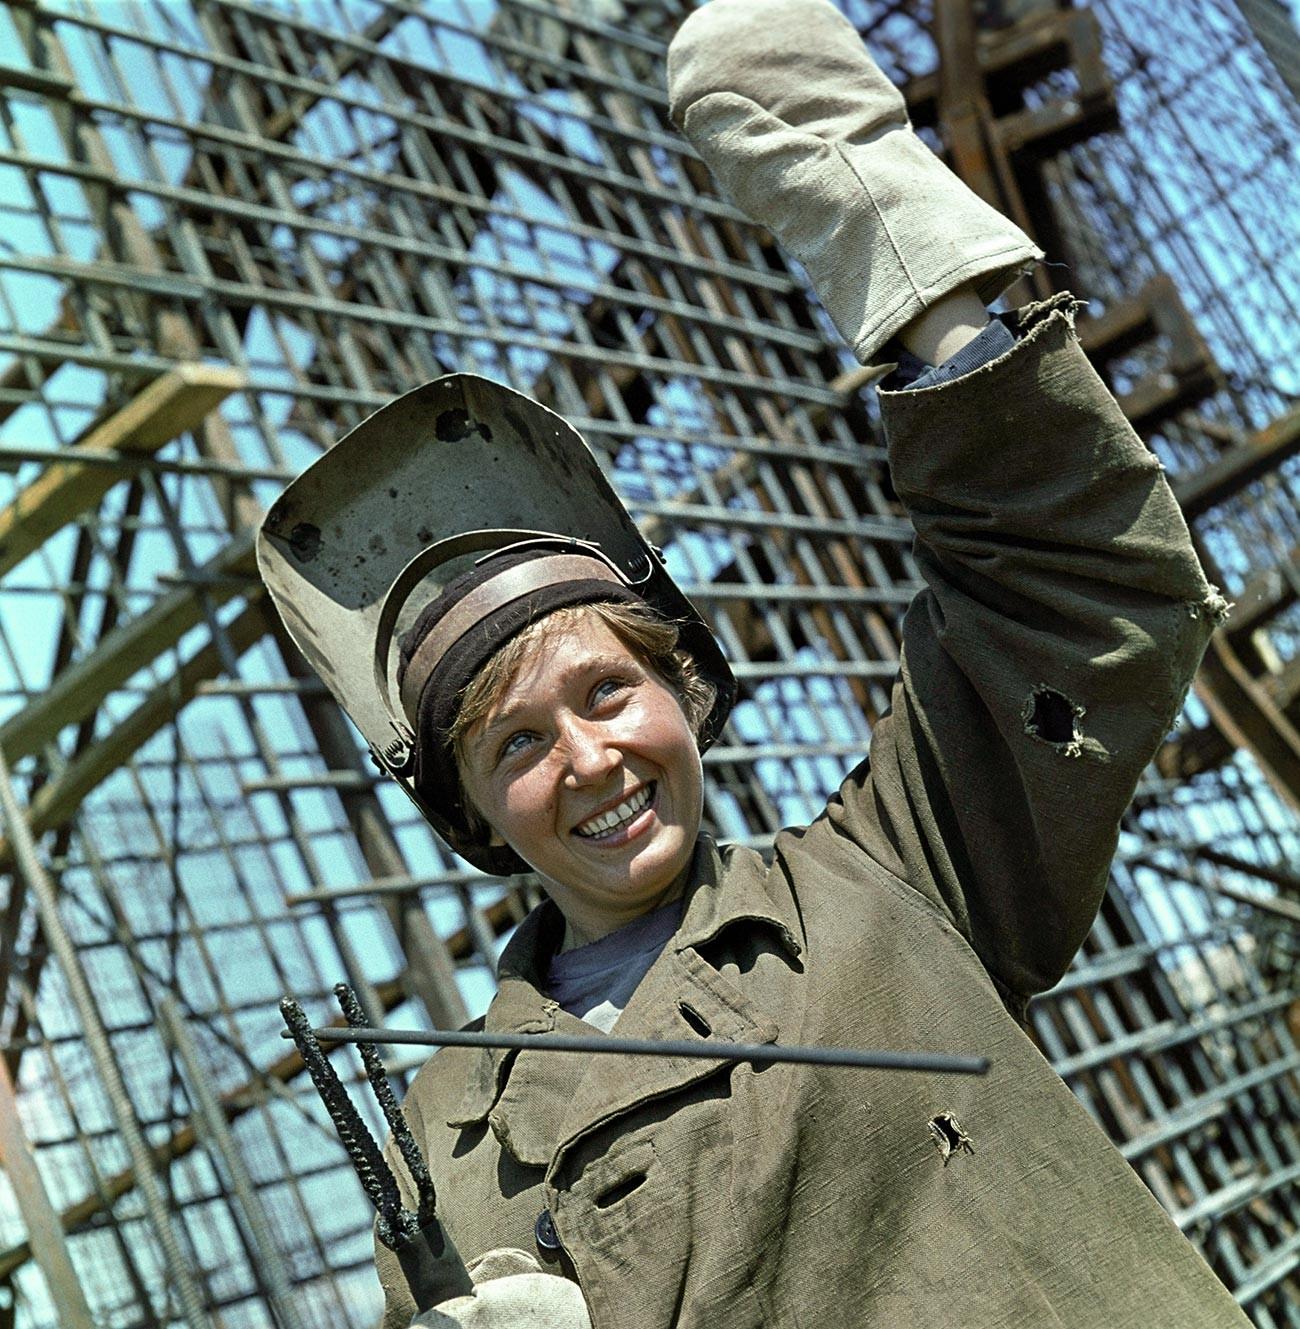 Foto Lyuba Tsyganok si tukang las jepretan Mikhail Kuleshov. Dipotret selama pembangunan Pembangkit Listrik Tenaga Air Kyiv (1964—1968).